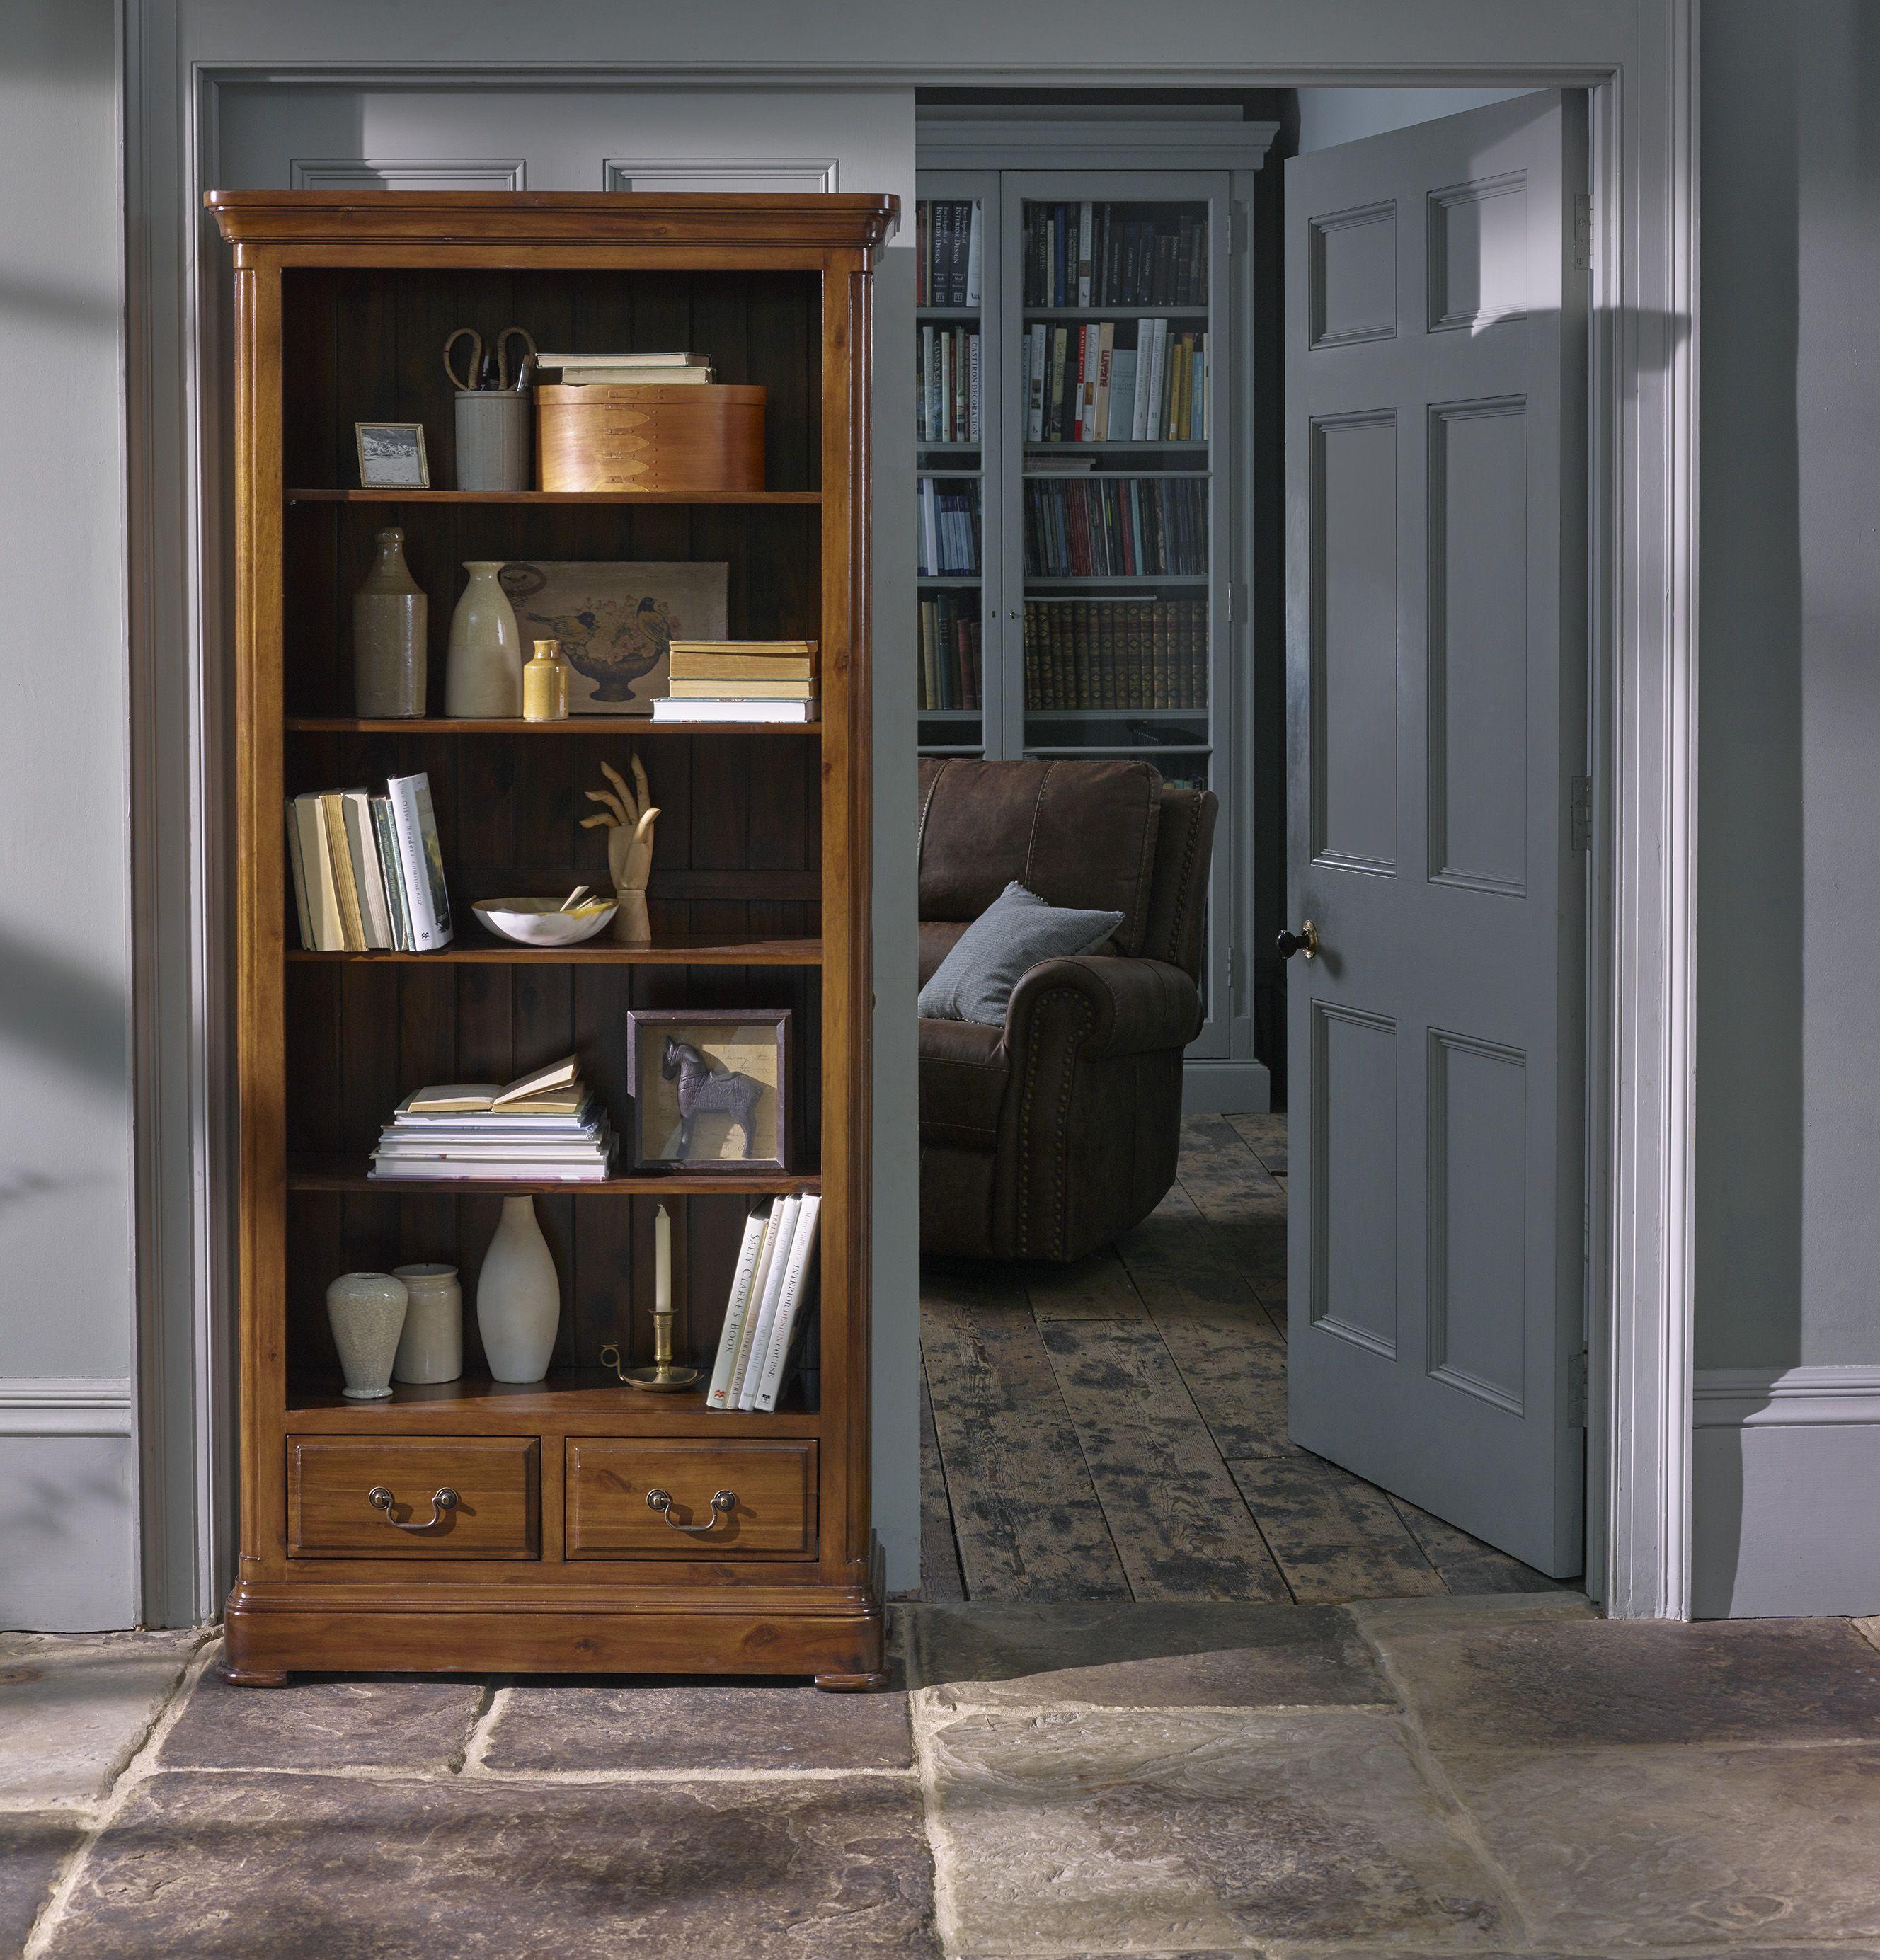 bookshelves open with size shelves cool full shelving photo back decorating book slim storage bookshelf oak doors furniture tall bookcase